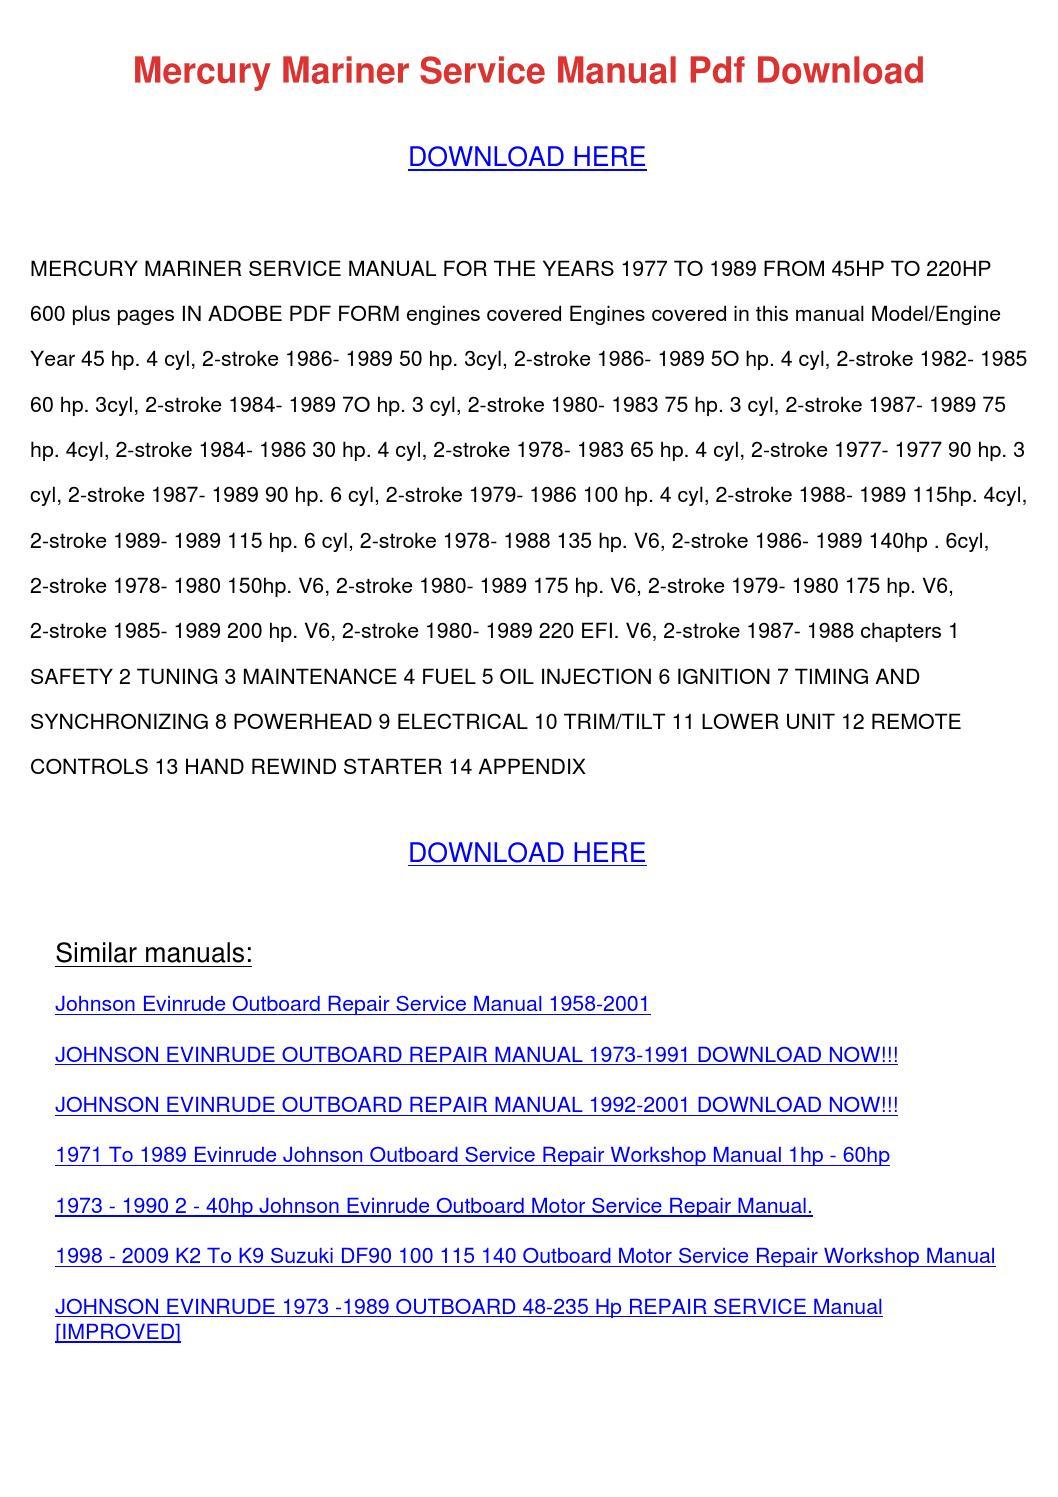 Mercury Mariner Service Manual Pdf Download by